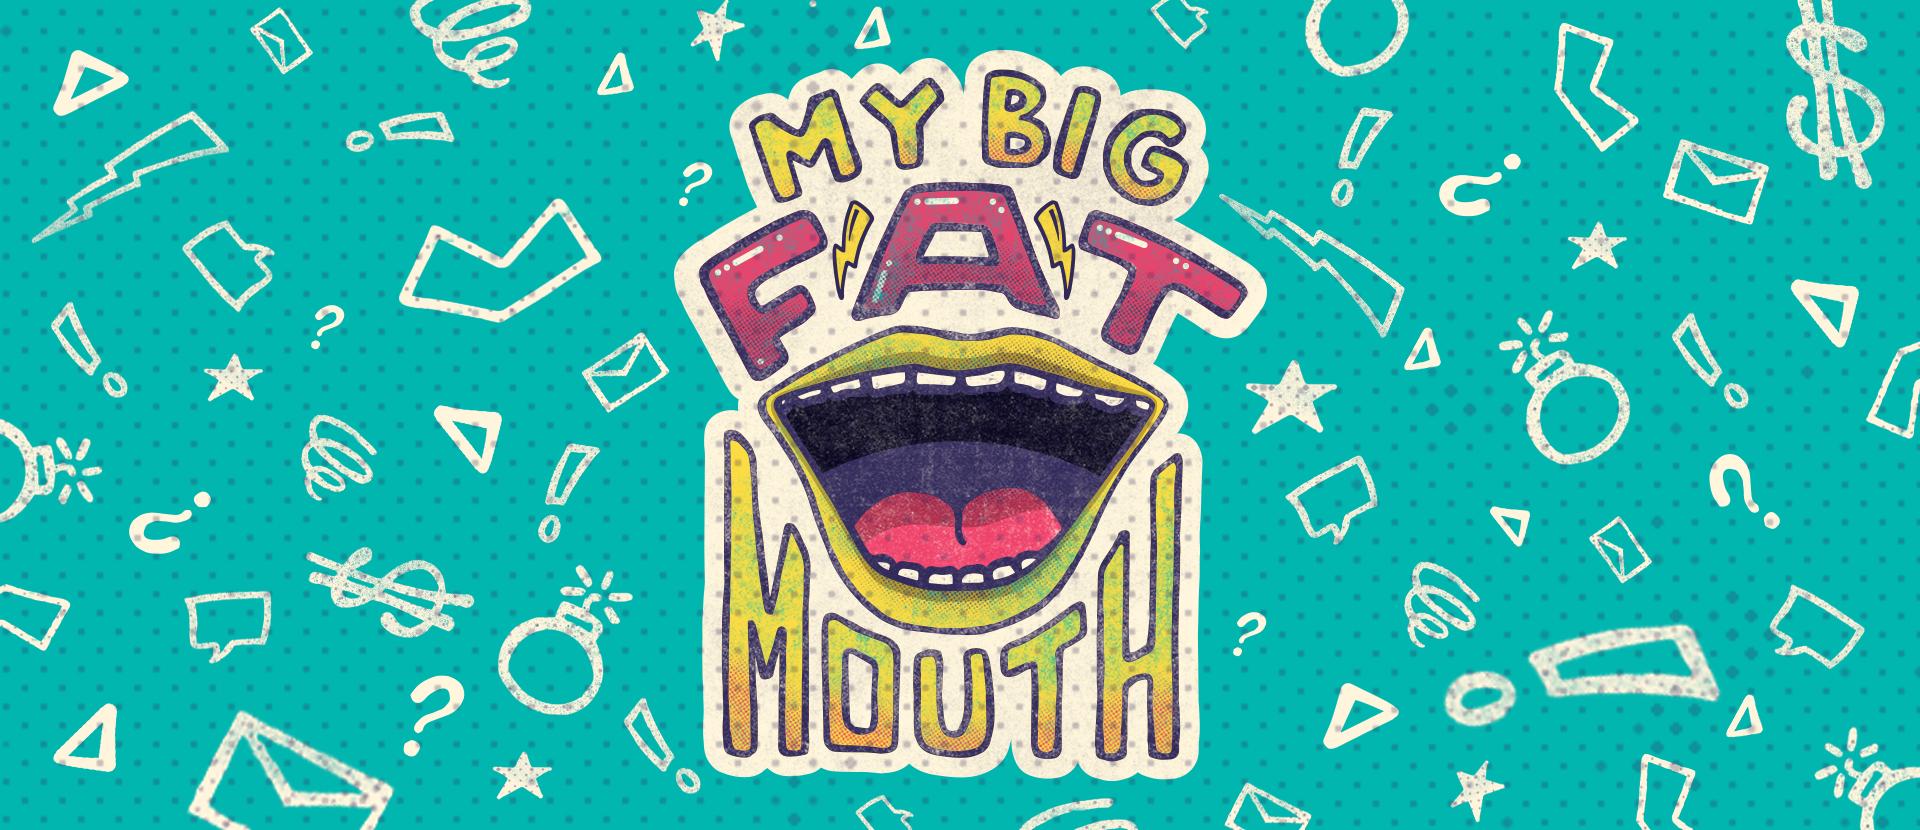 My Big Fat Mouth Main Screen.png